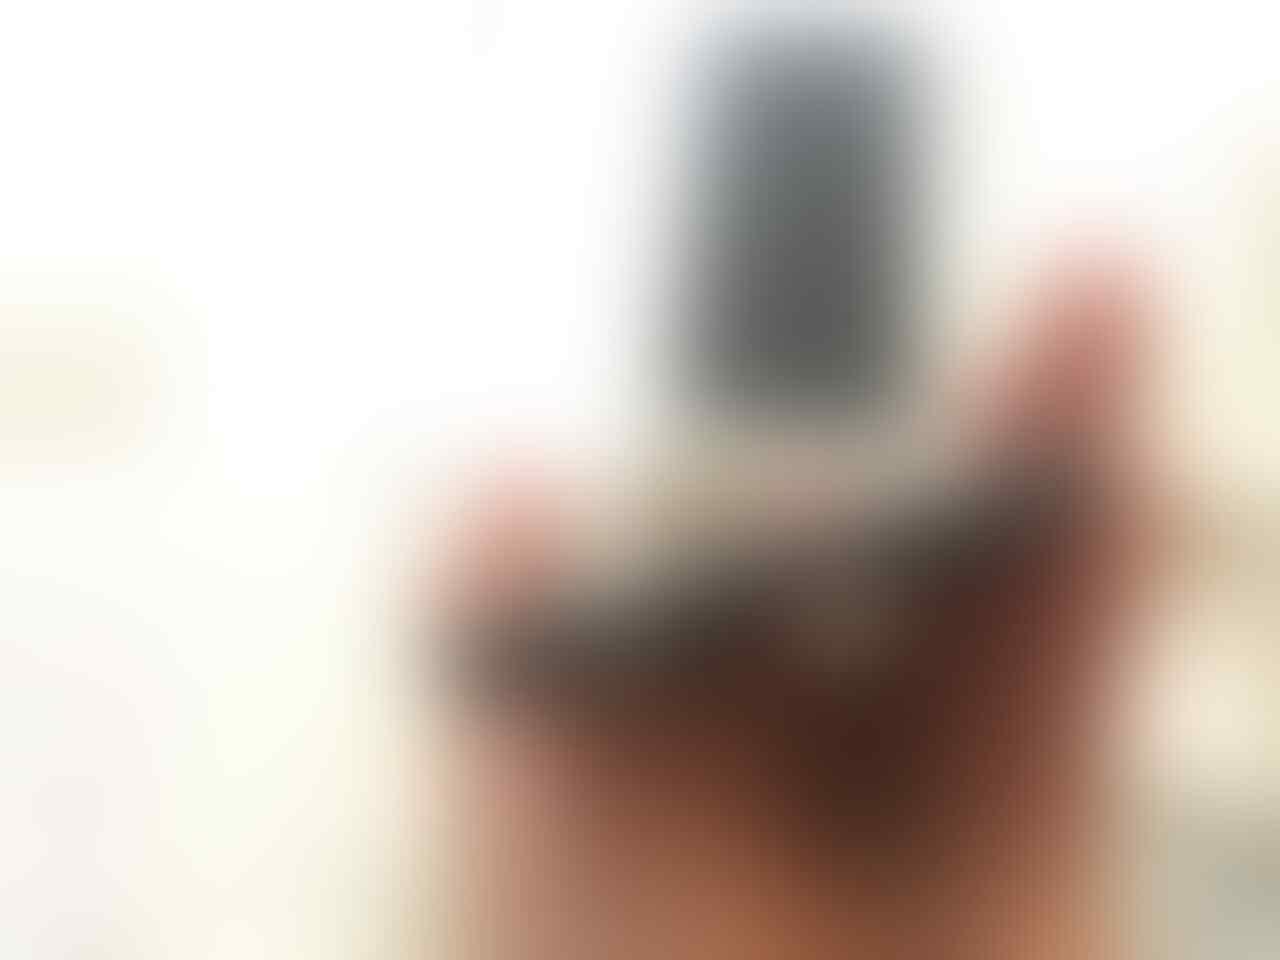 IPHONE 7 BLACKMATTE 256GB FULL ORI FULLSET MUURAAAHH 6900 SAJA [MALANG]